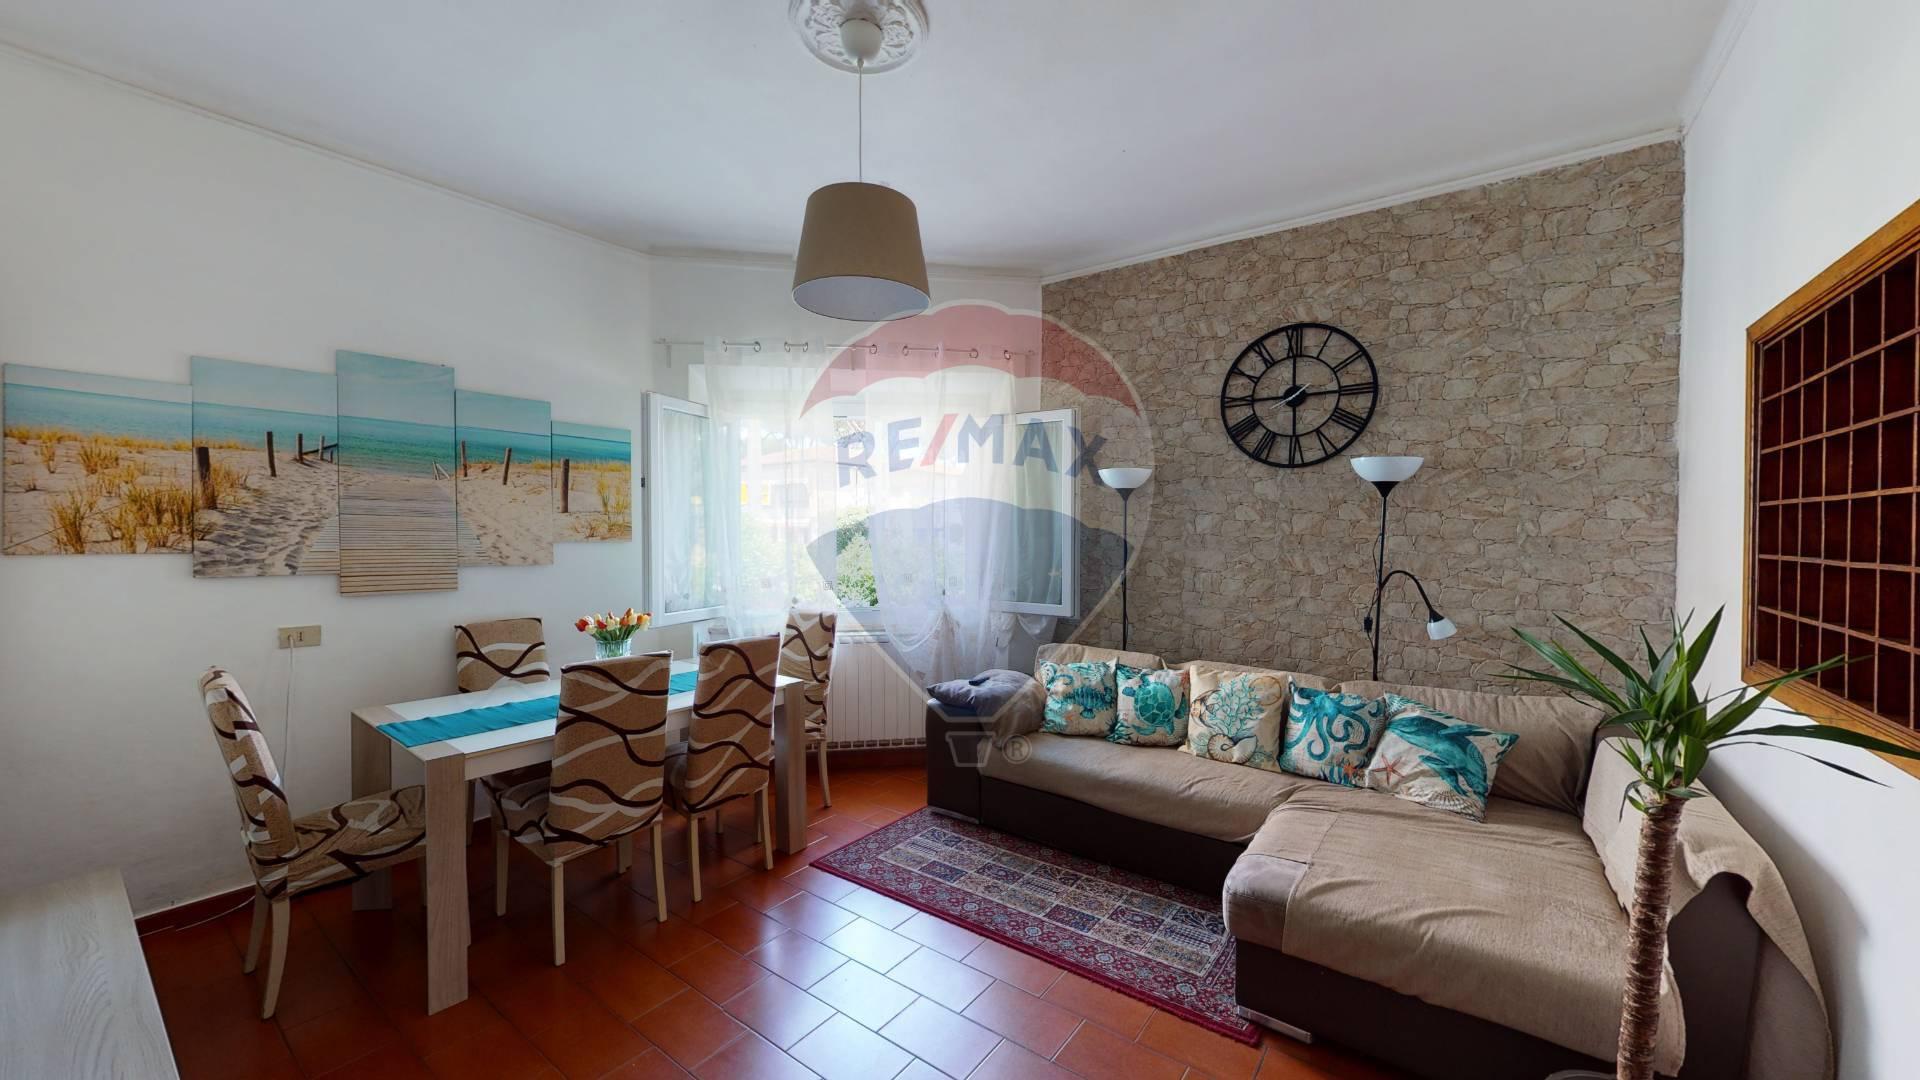 viareggio vendita quart: darsena re-max-quality-house